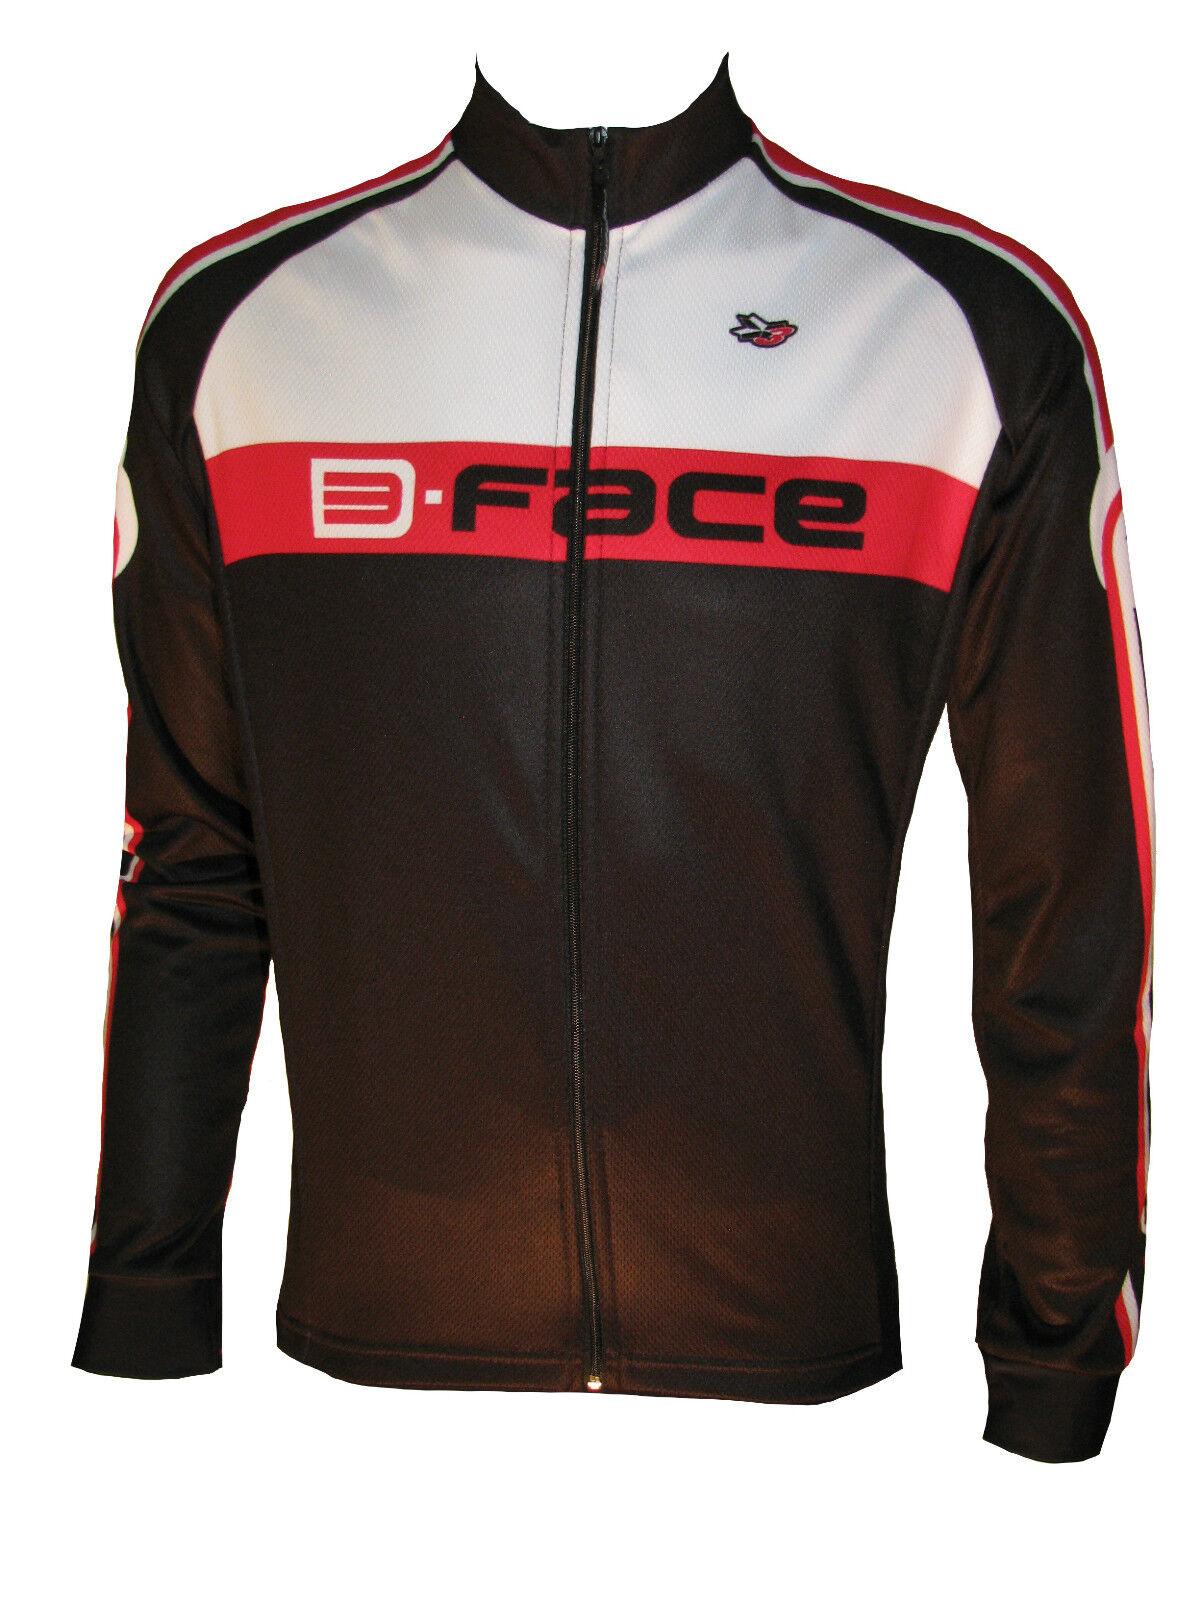 Maglia manica lunga ciclismo ciclismo lunga termica traspirante giacca leggera rosso autunno 3f1b51